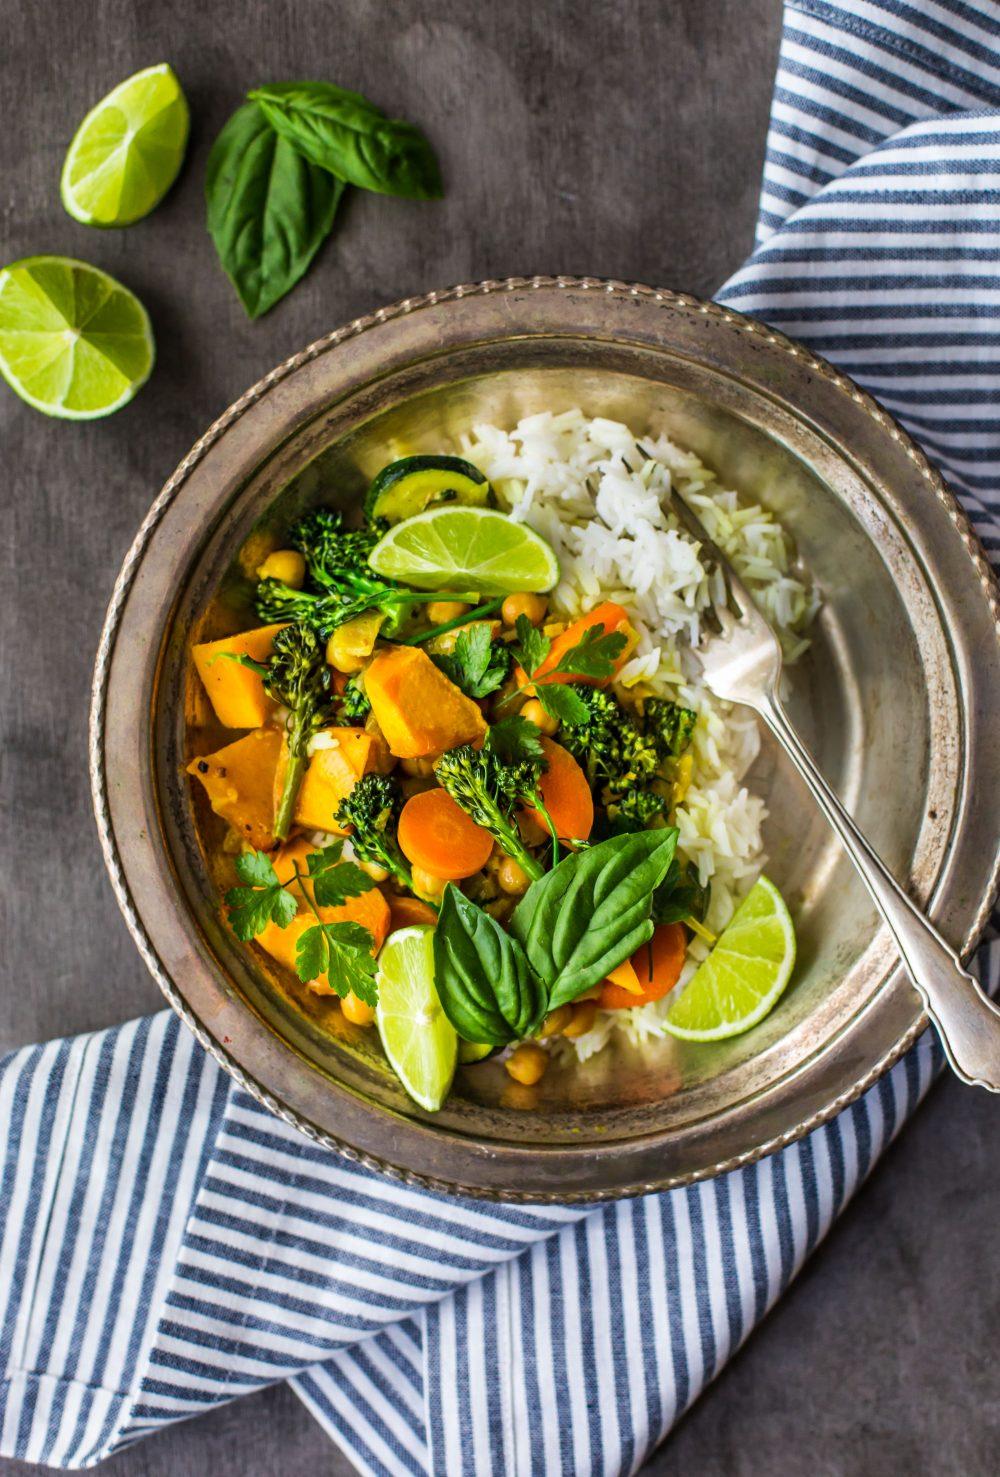 pumpkin-coconut-curry-delicious-vegan-vegetable-curry-dinner-healthy-gluten-free-vegan